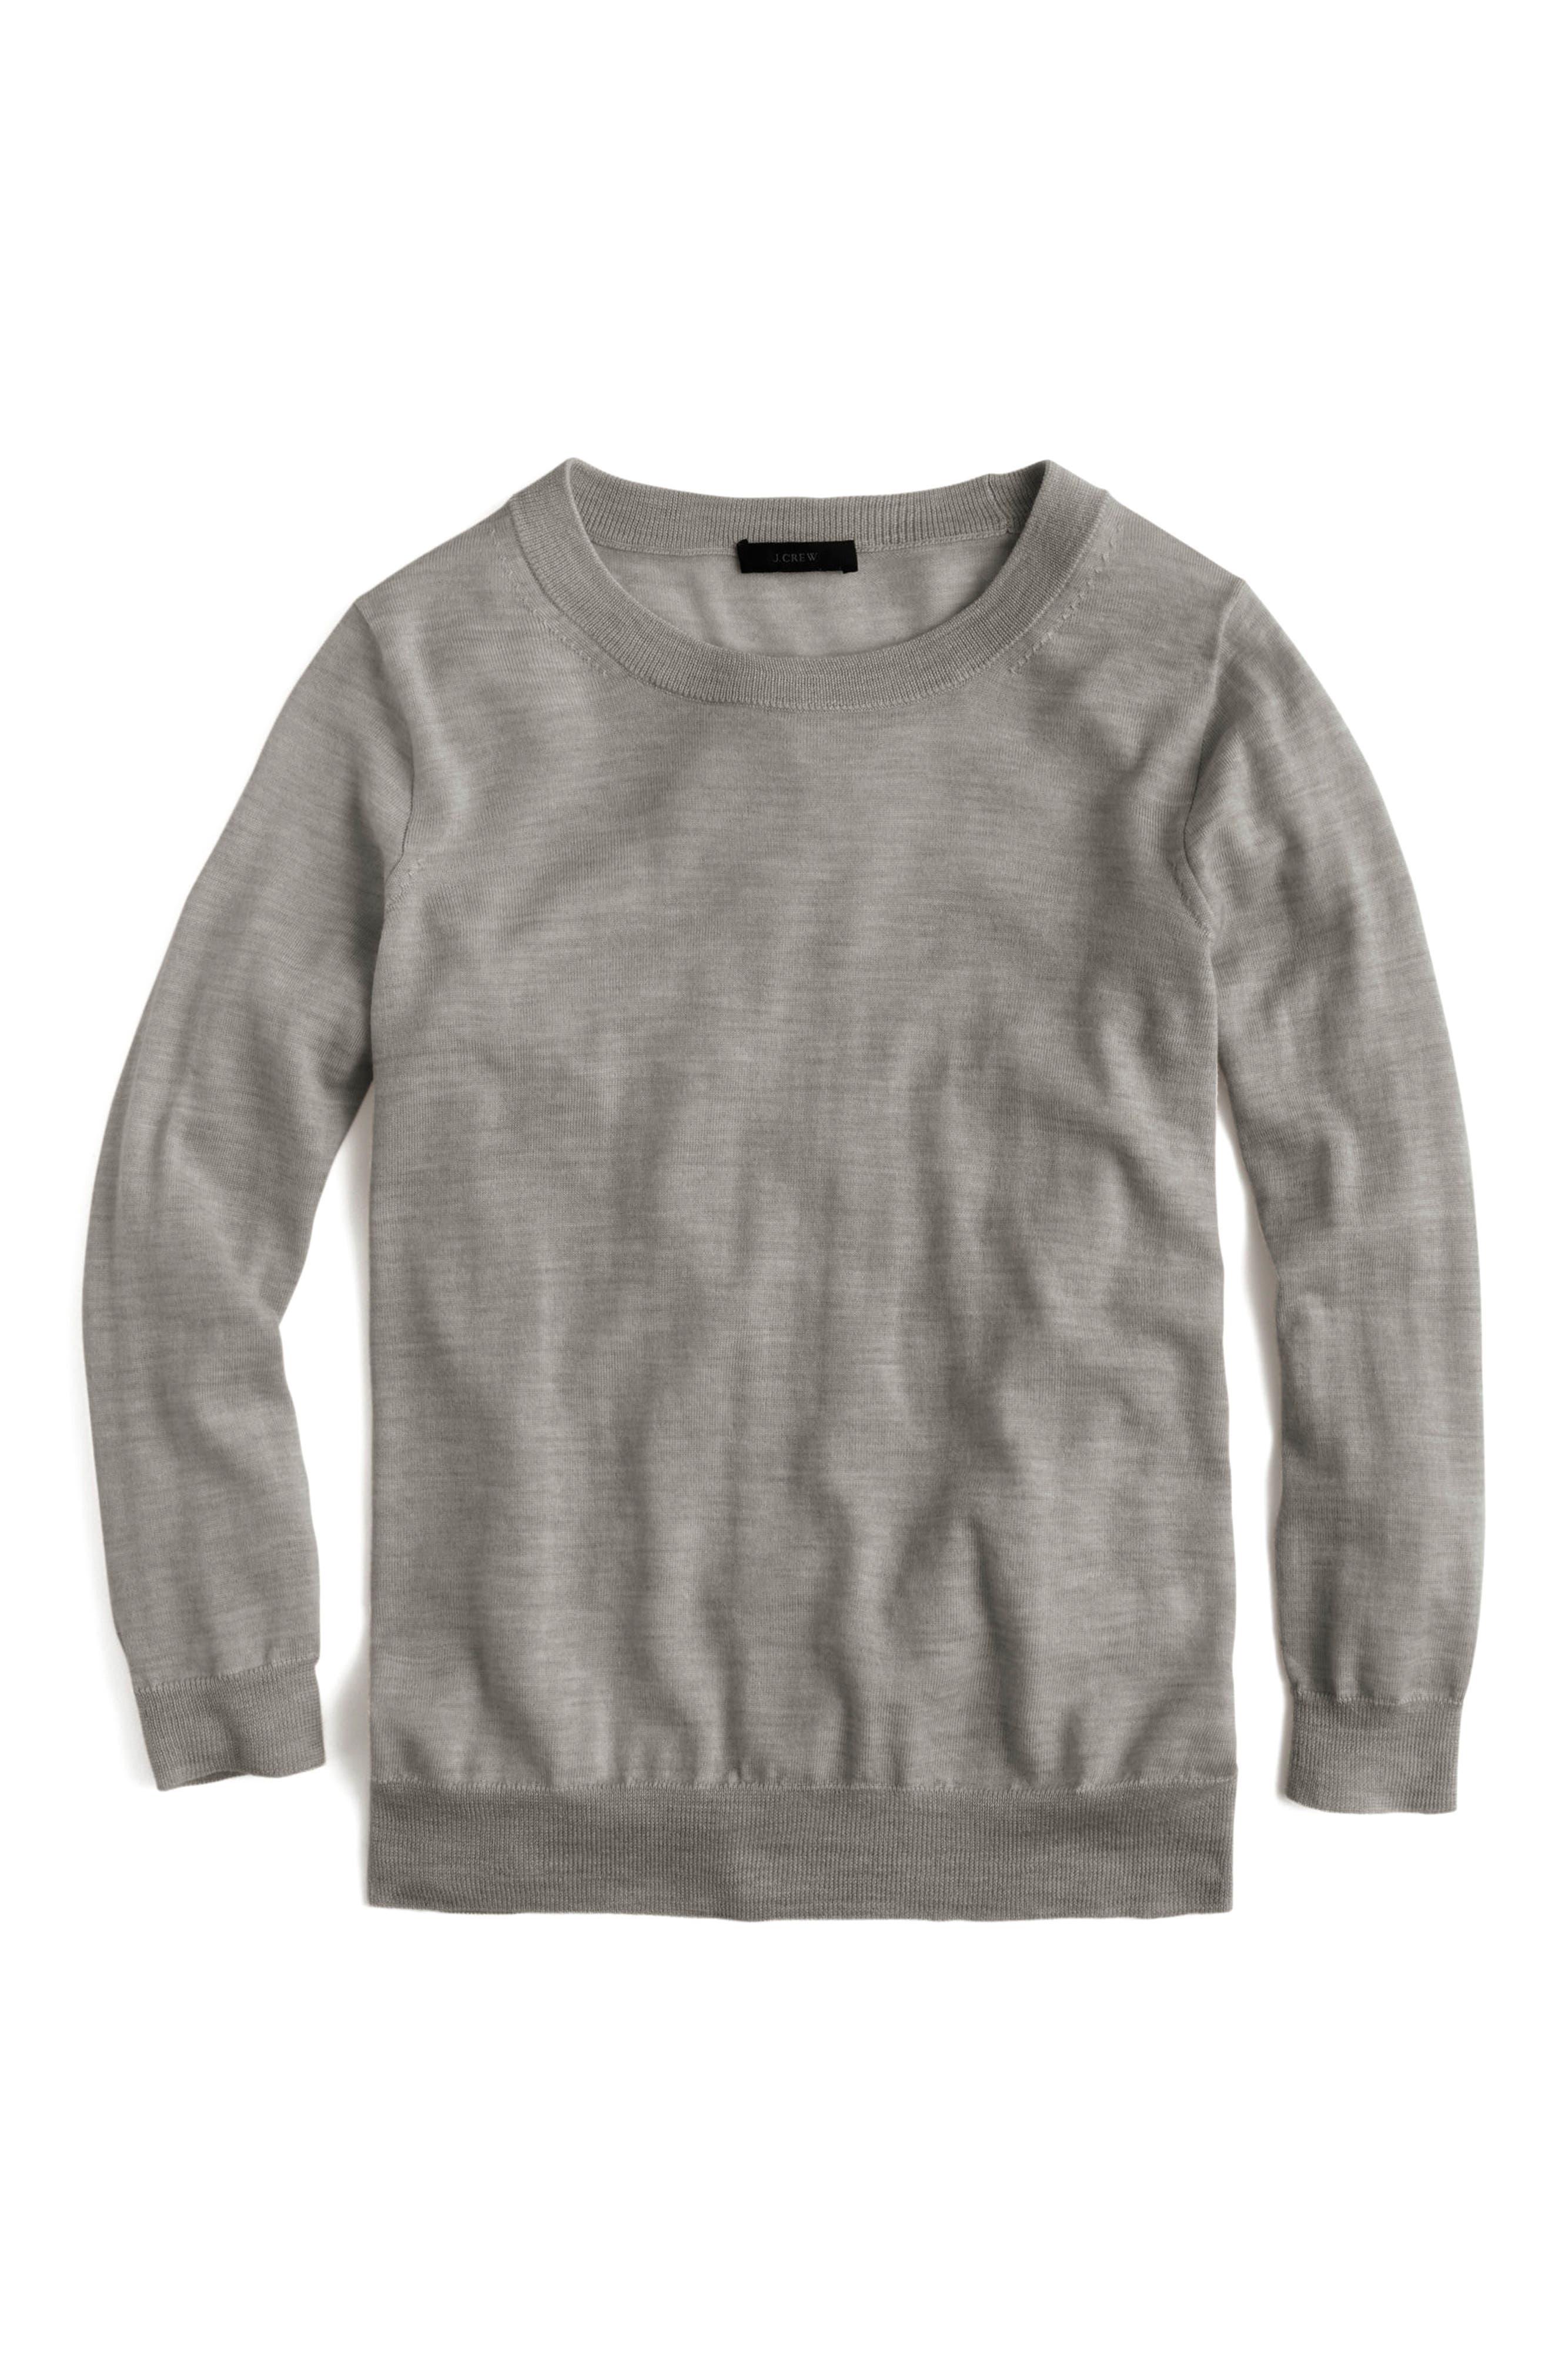 Alternate Image 3  - J.Crew Tippi Merino Wool Sweater